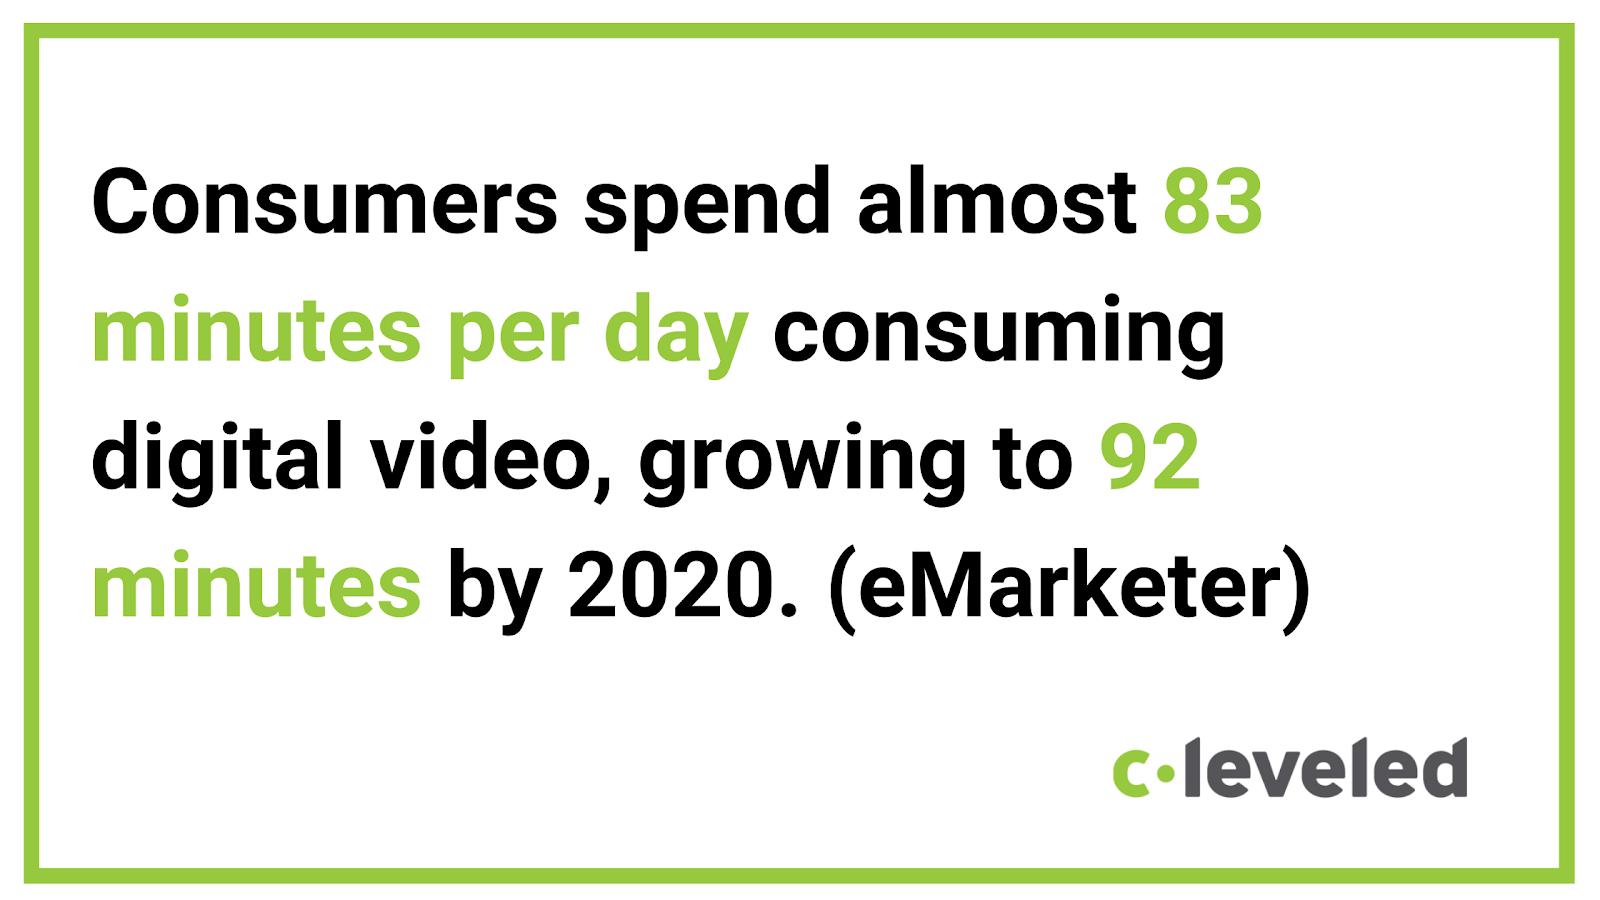 consuemrs prefer video content